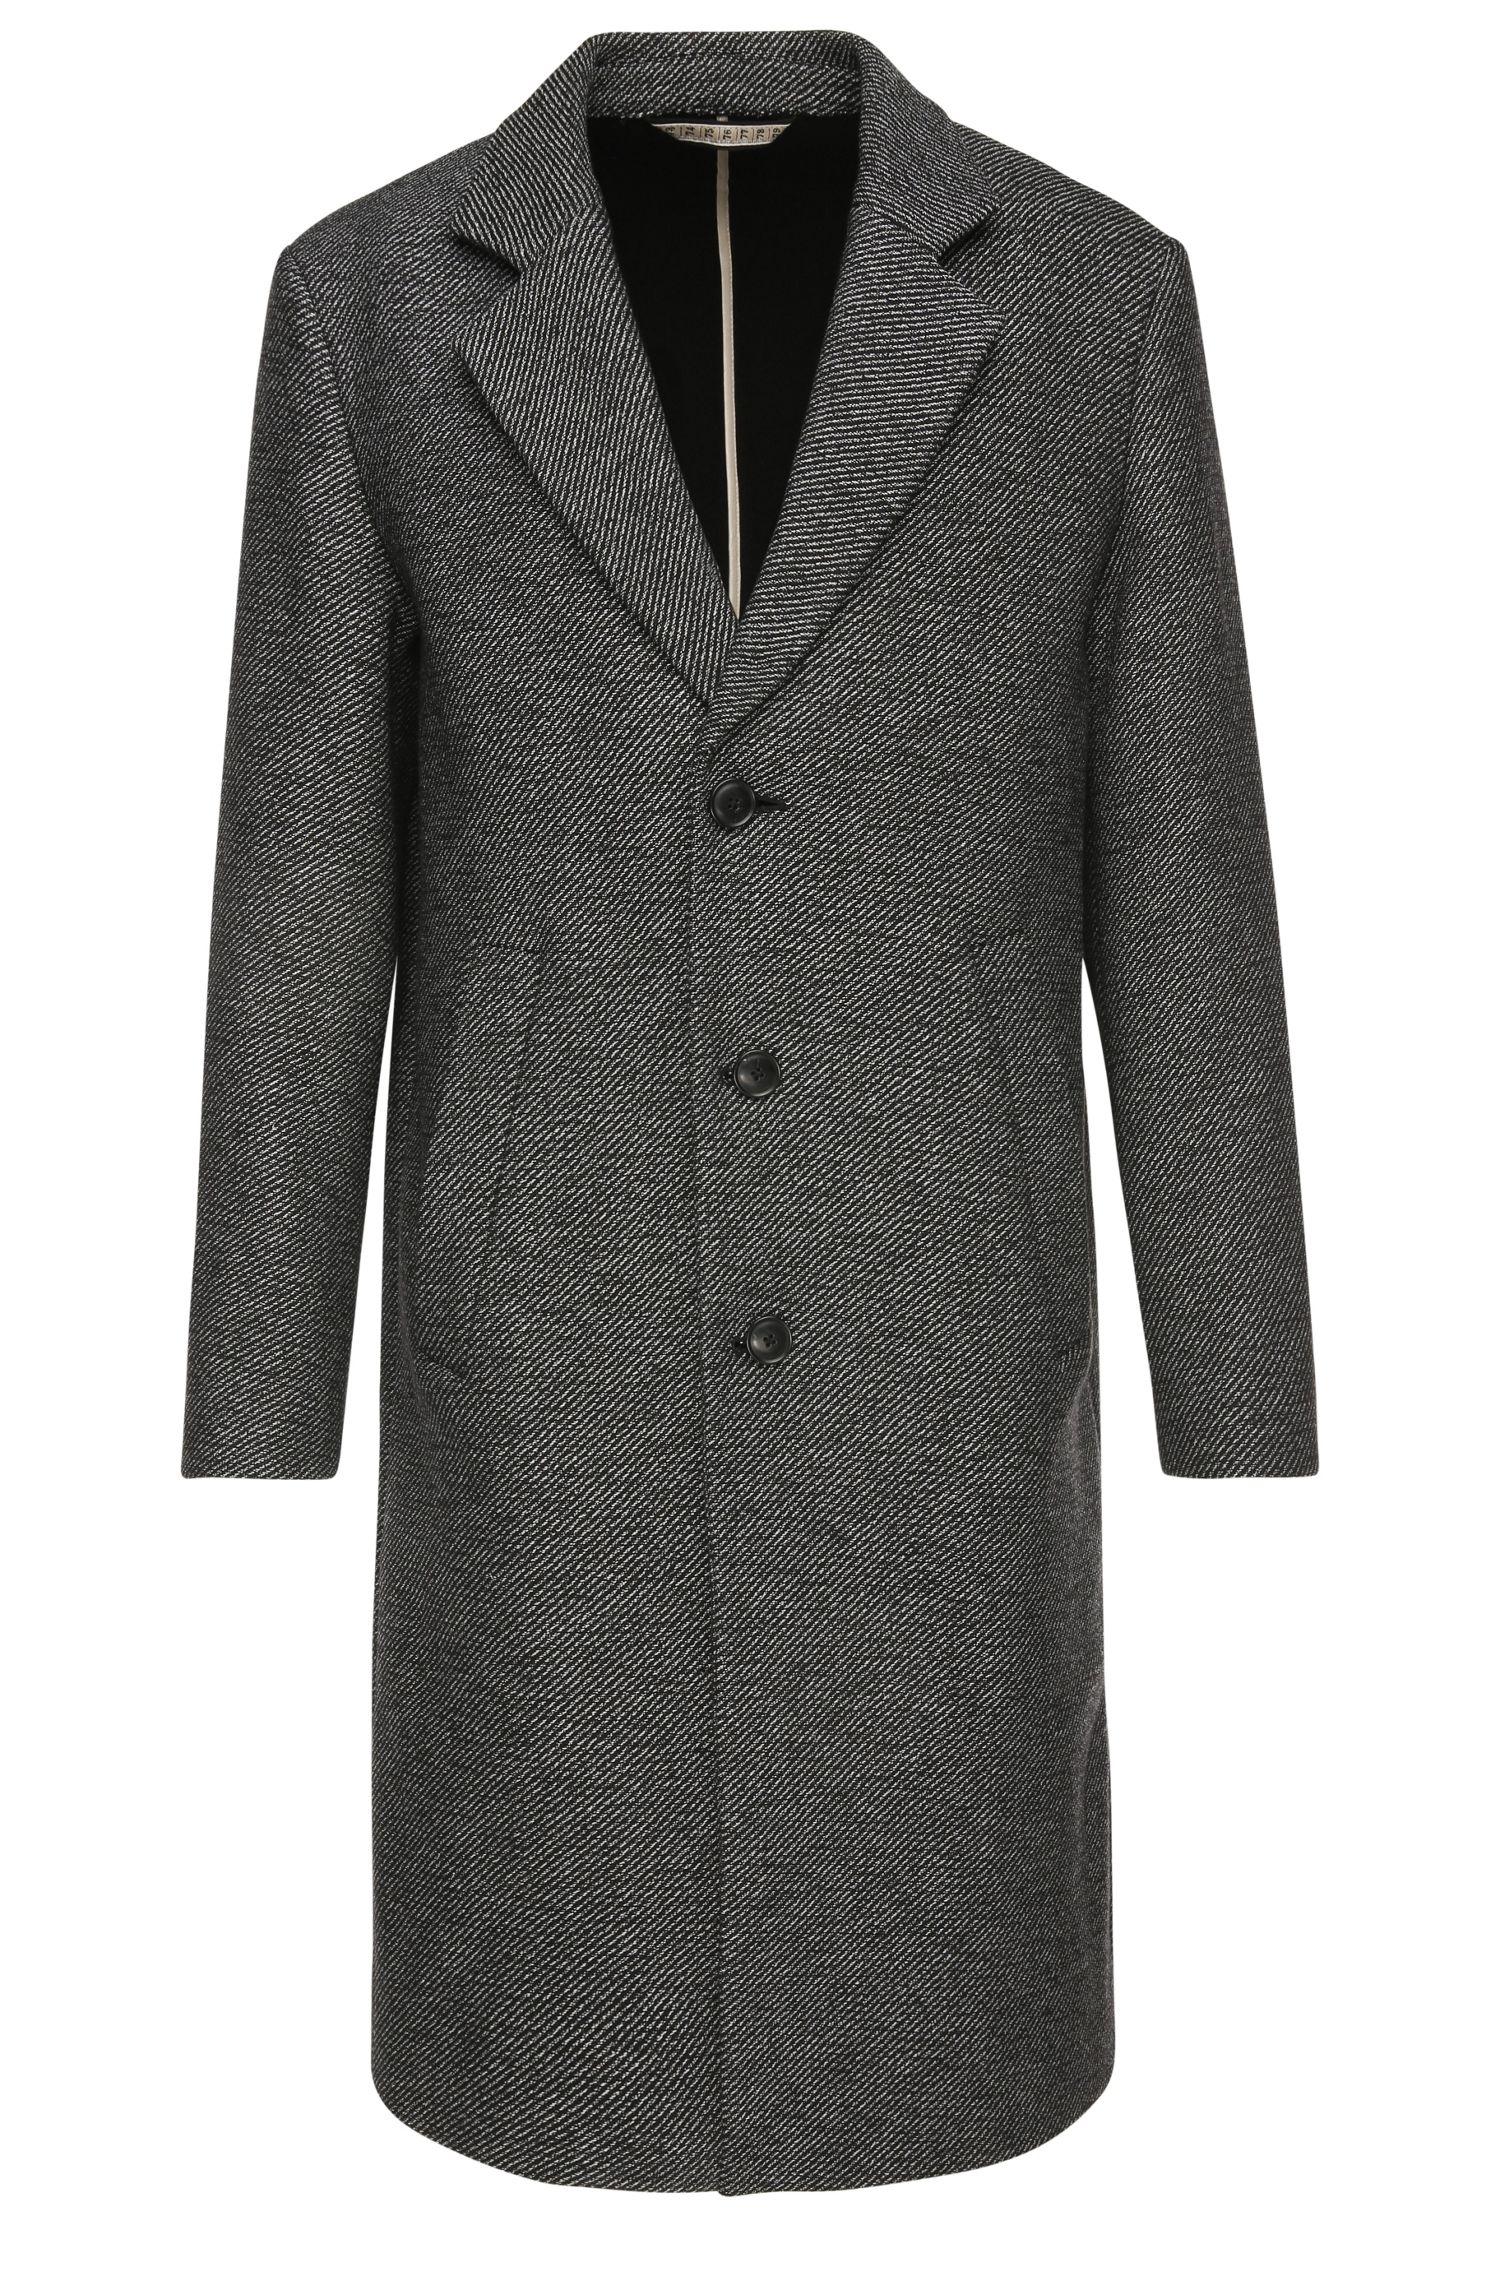 'Bear'   Wool Cotton Blend Double Twill Coat